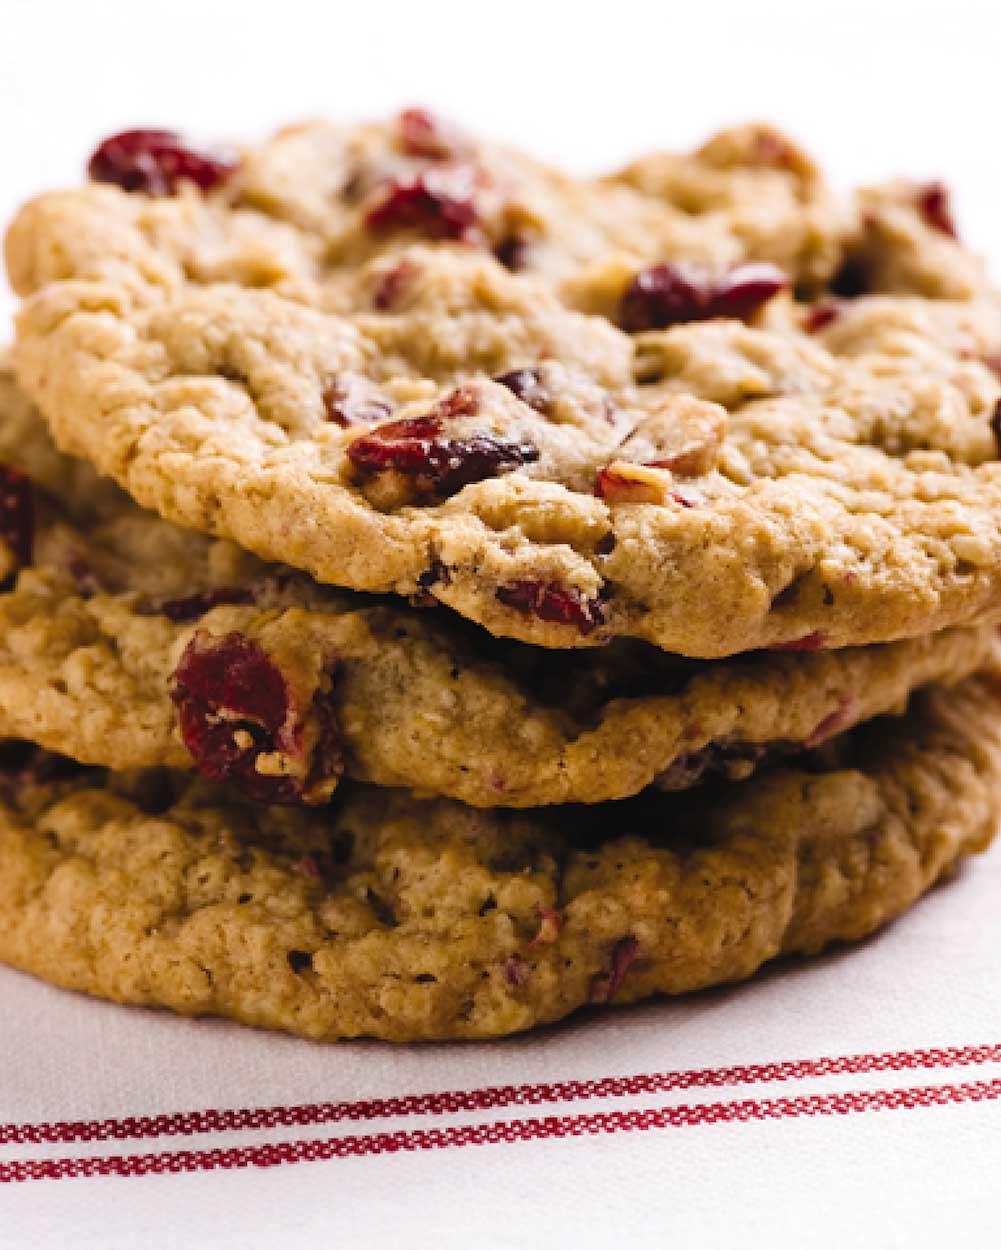 Cinnamon-Sugar Glazed Oatmeal Cookies